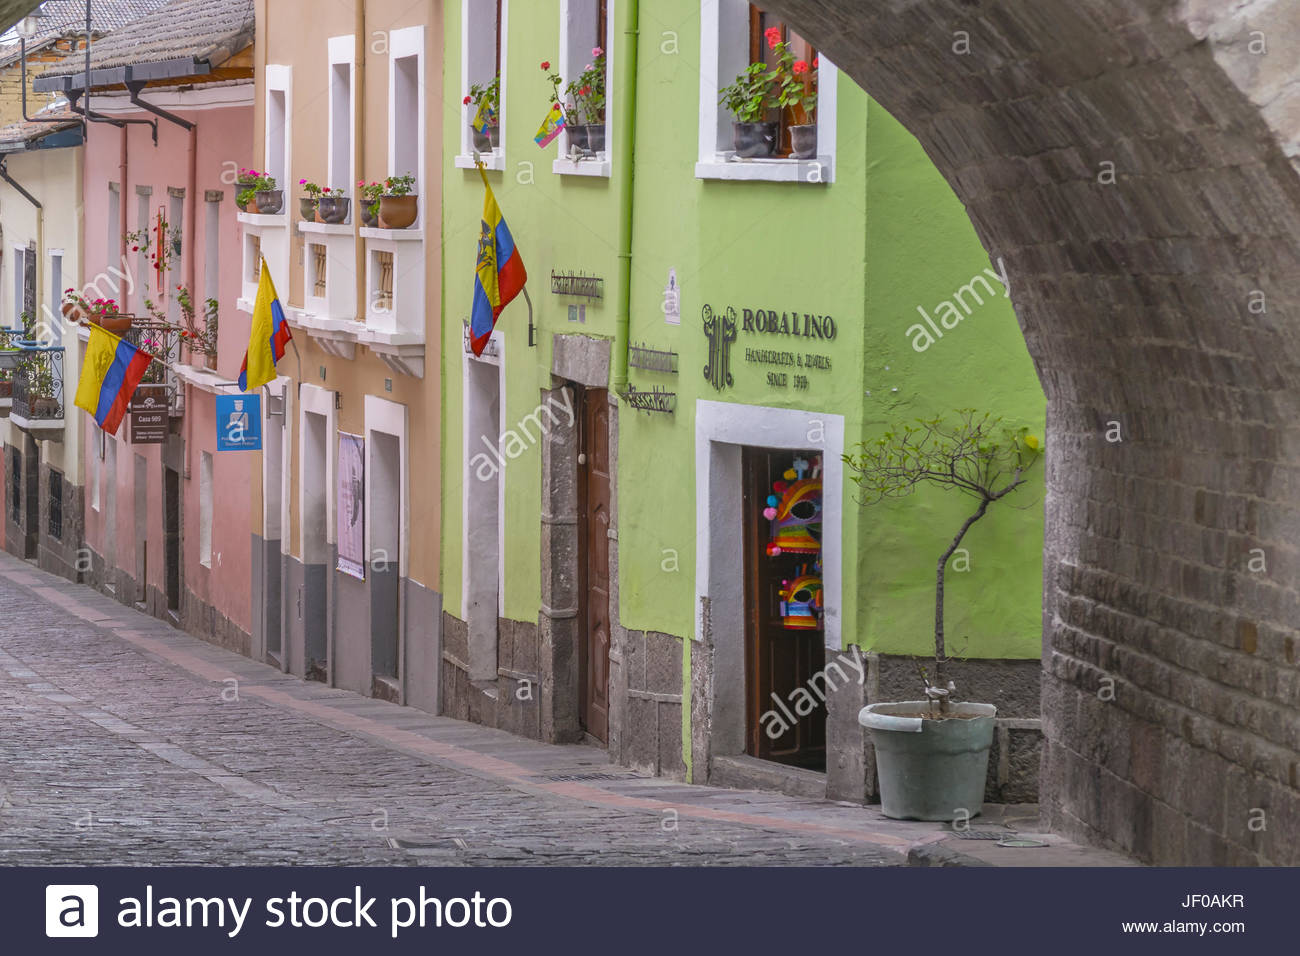 La Ronda Quito Ecuador Imagen De Stock